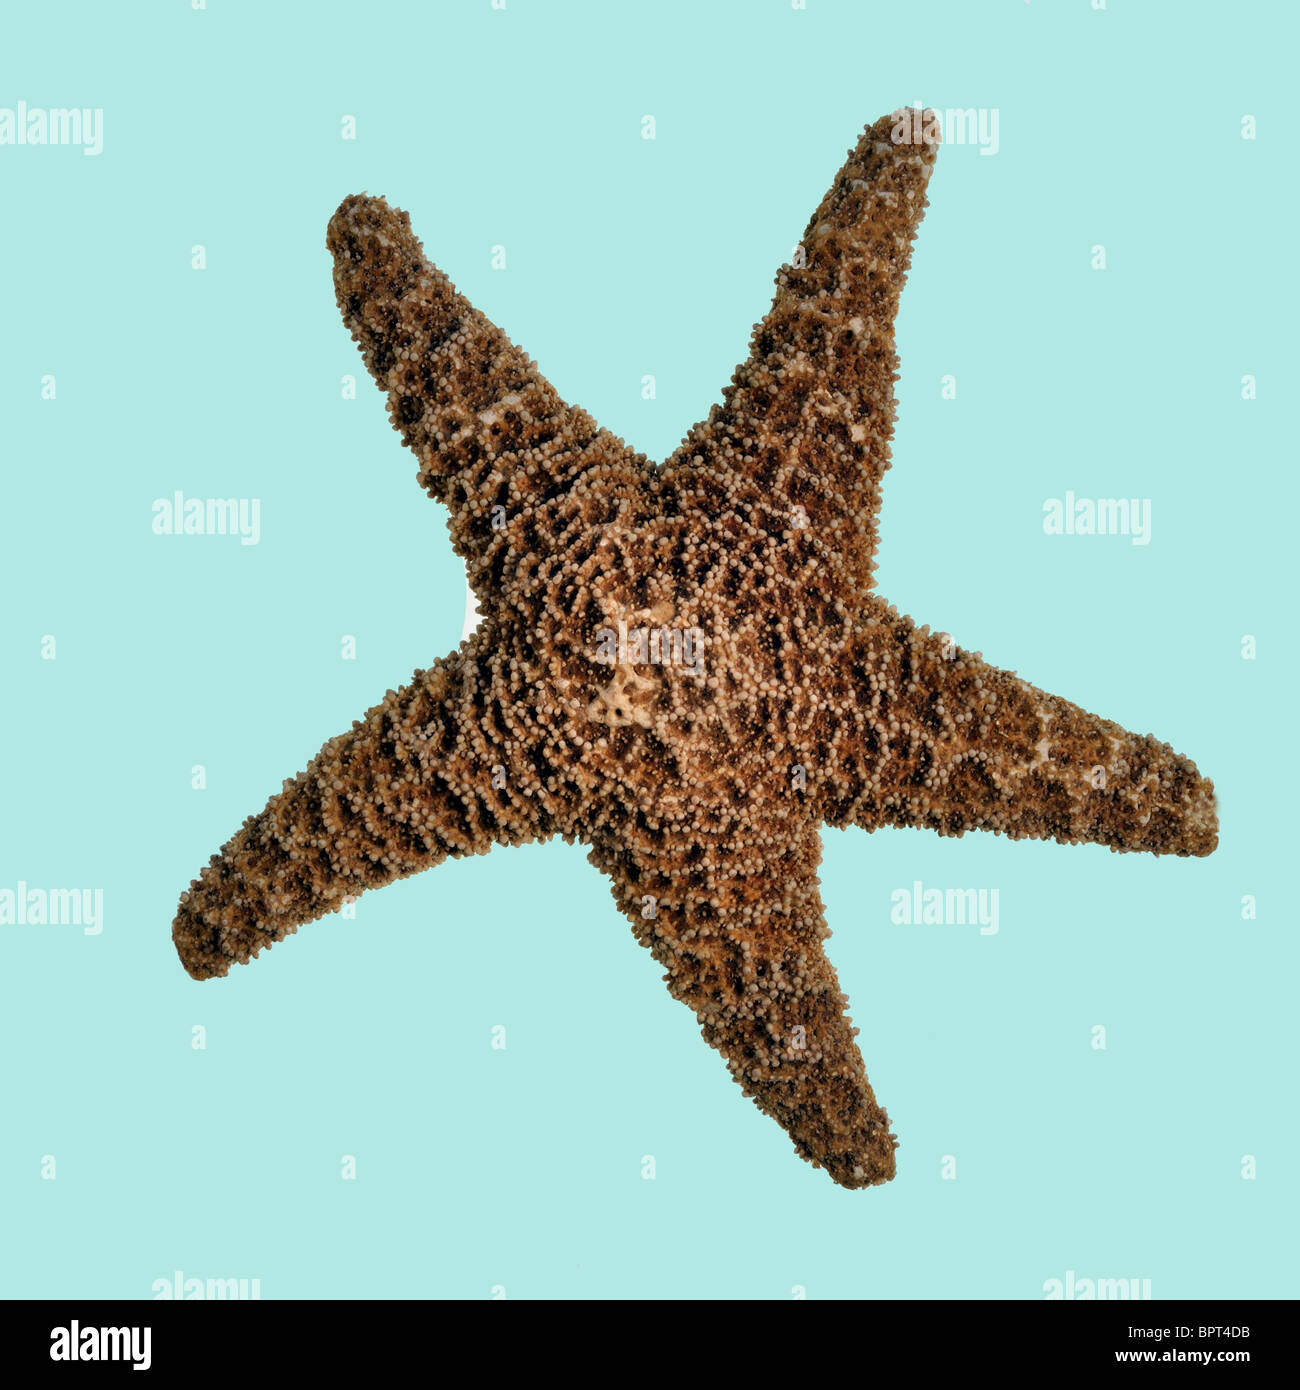 Starfish on light blue backround - Stock Image